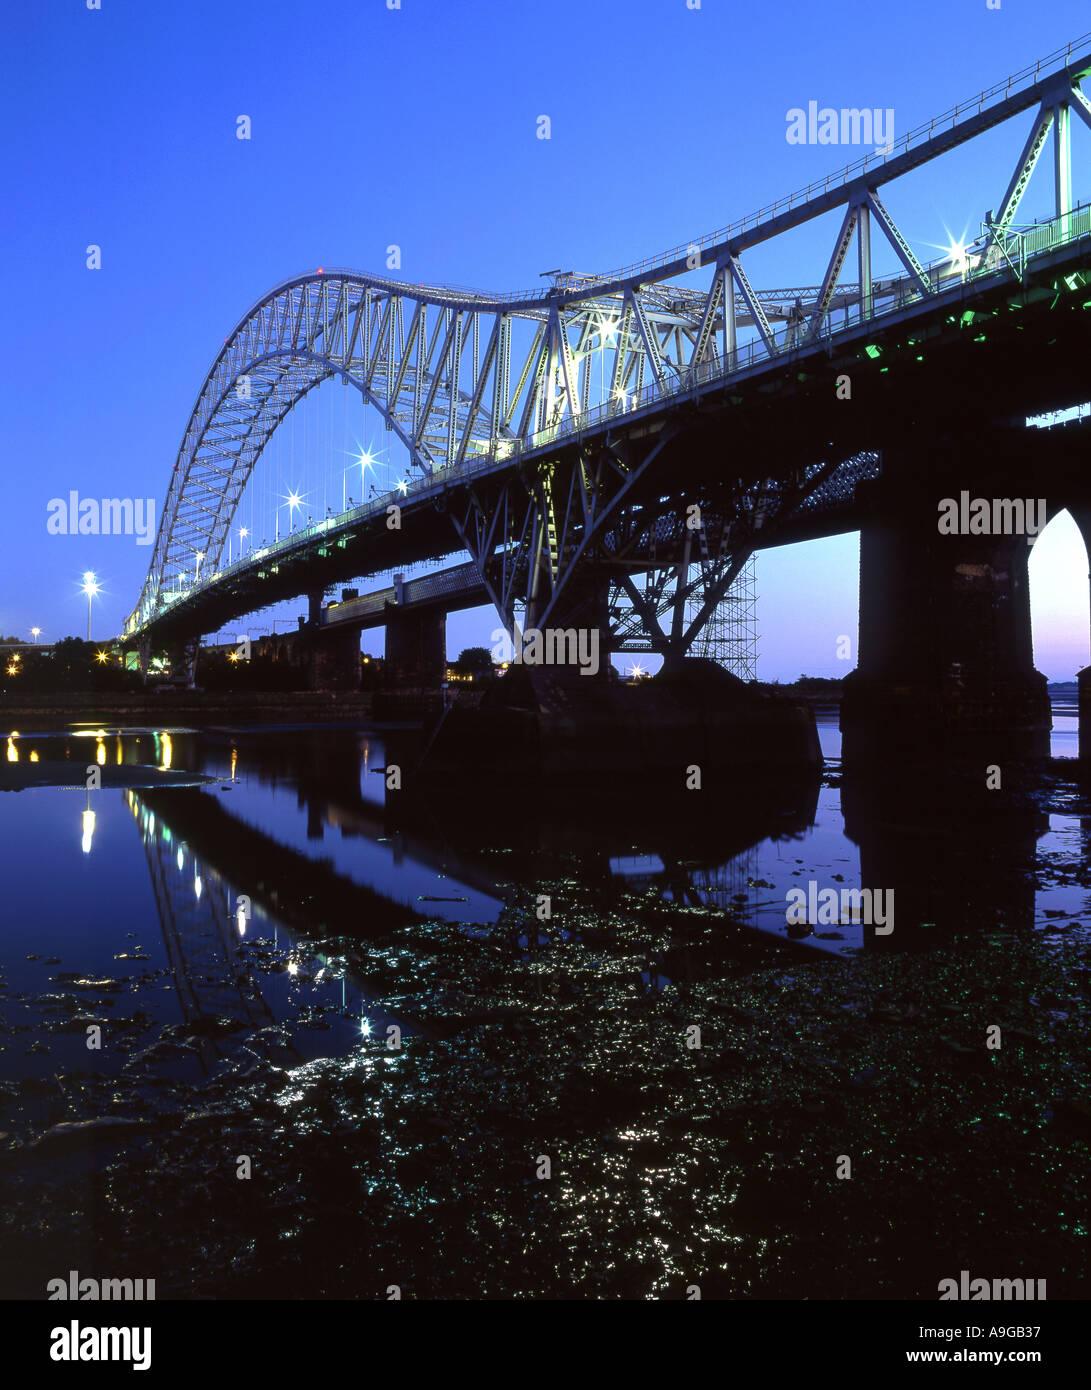 The Runcorn Widnes Roadbridge Spanning the River Mersey at Night Cheshire UK - Stock Image